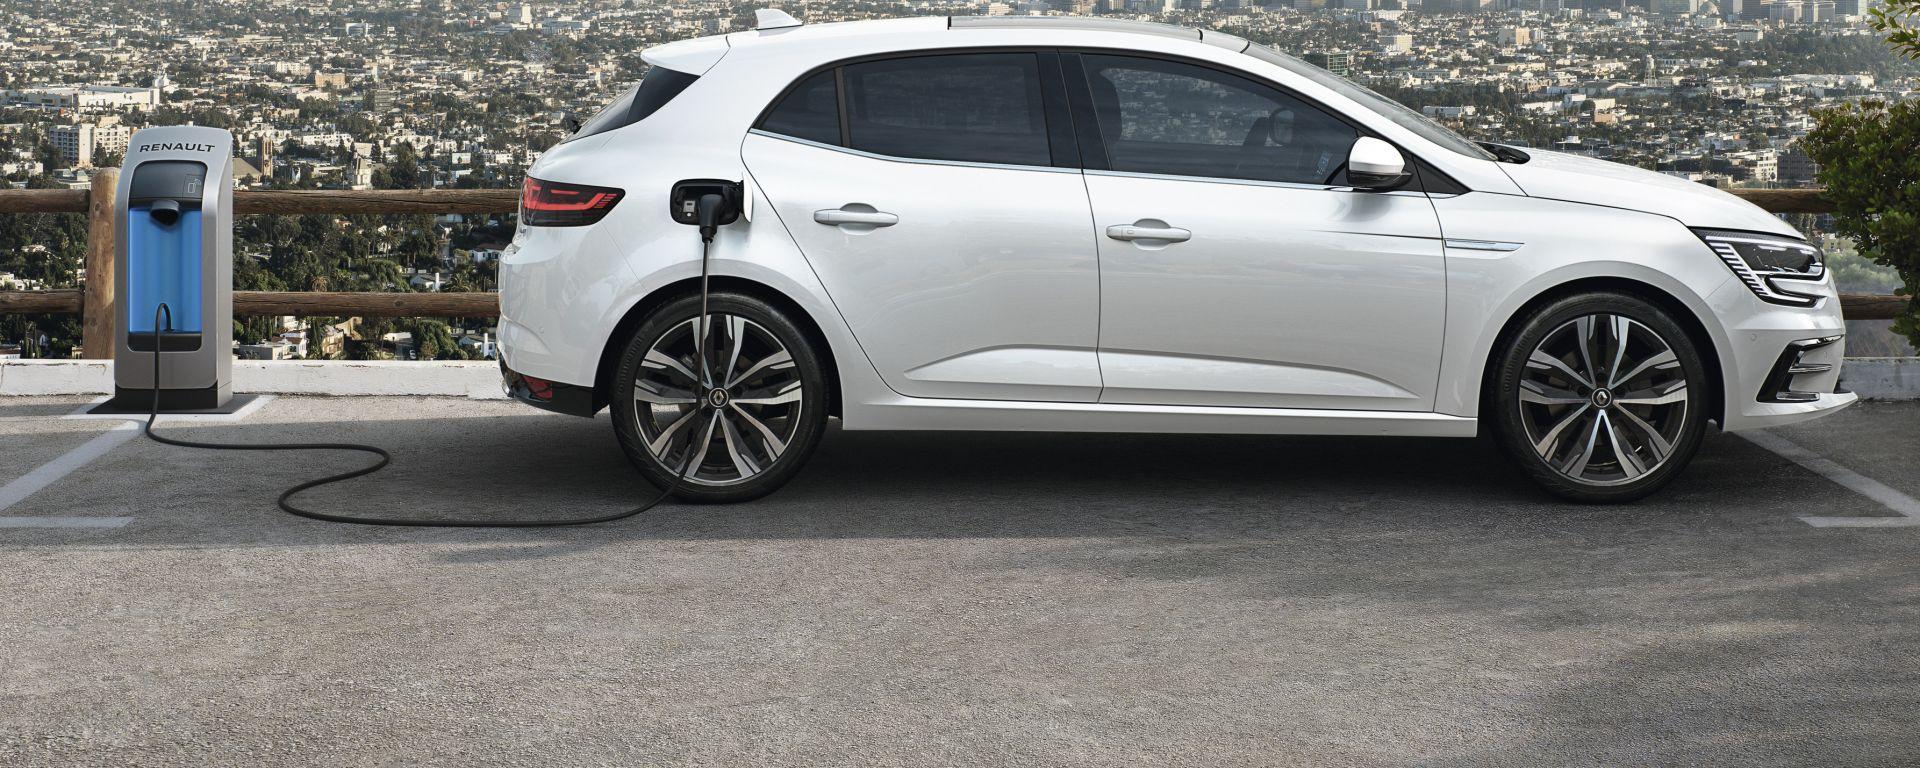 Renault Mégane Hatchback E-Tech